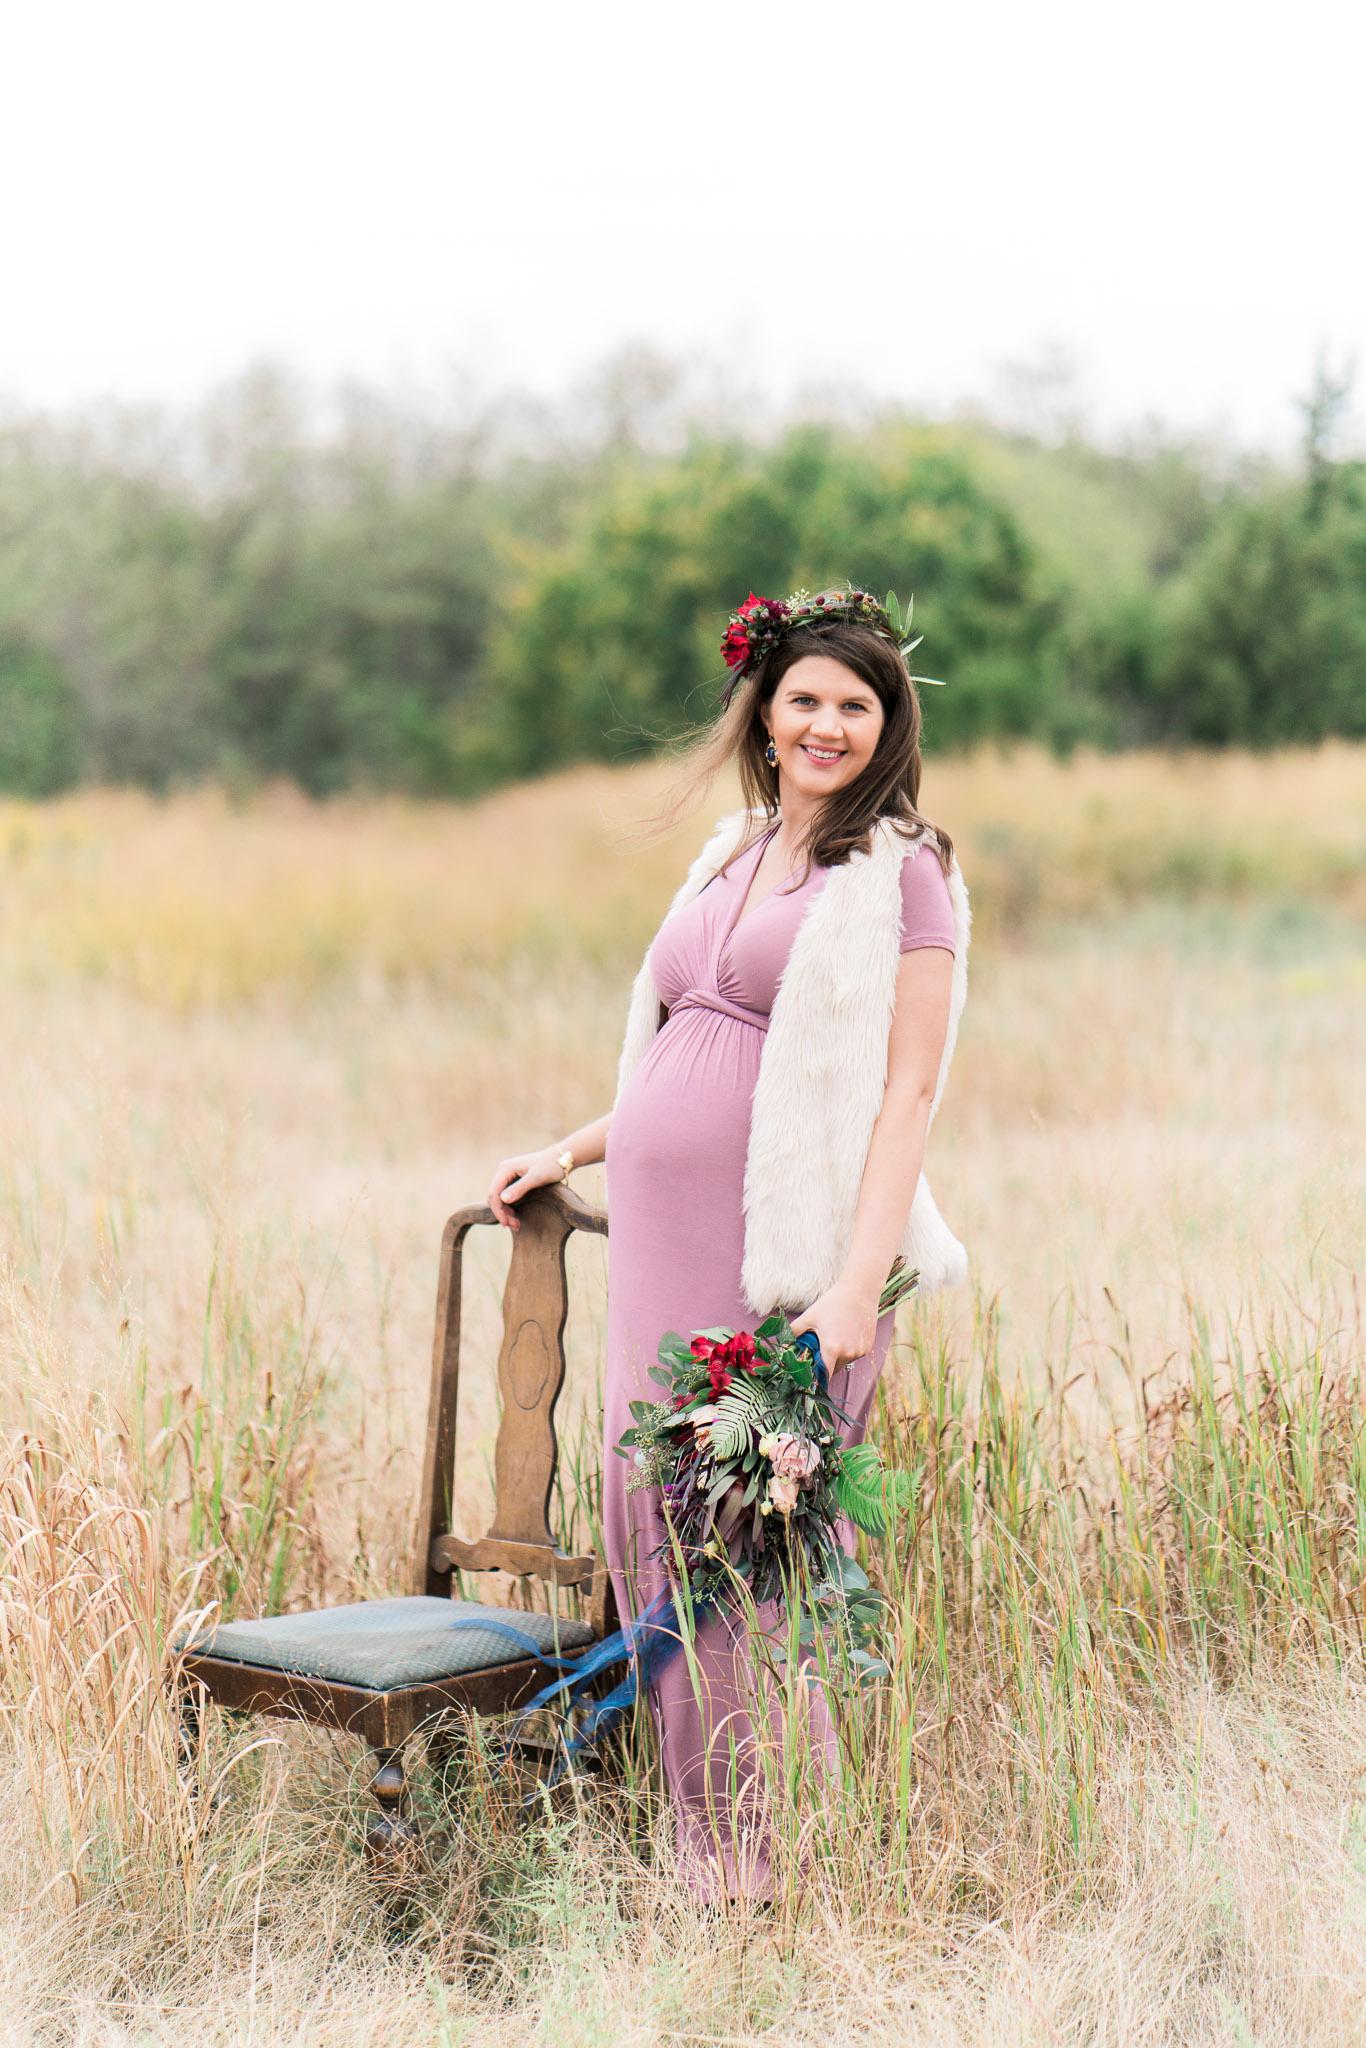 Lizanne-Andrew-Maternity-Kate-Bernard-Photography-Web-61.jpg